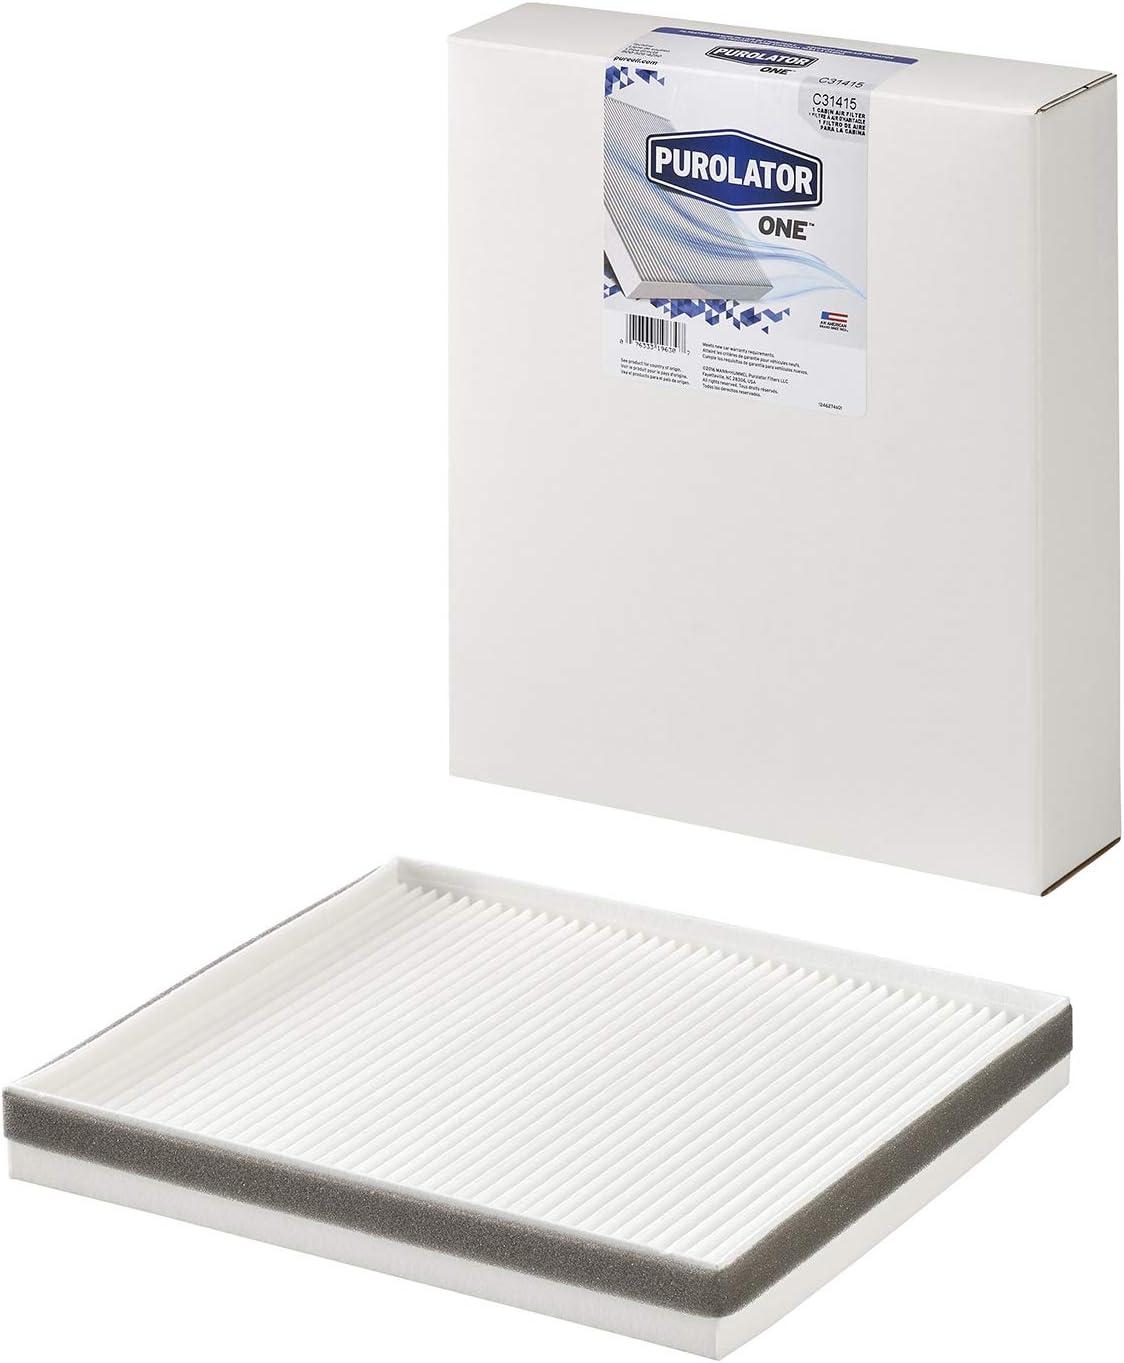 Beauty products Purolator C31415 Be super welcome PurolatorONE Advanced Air Cabin Filter